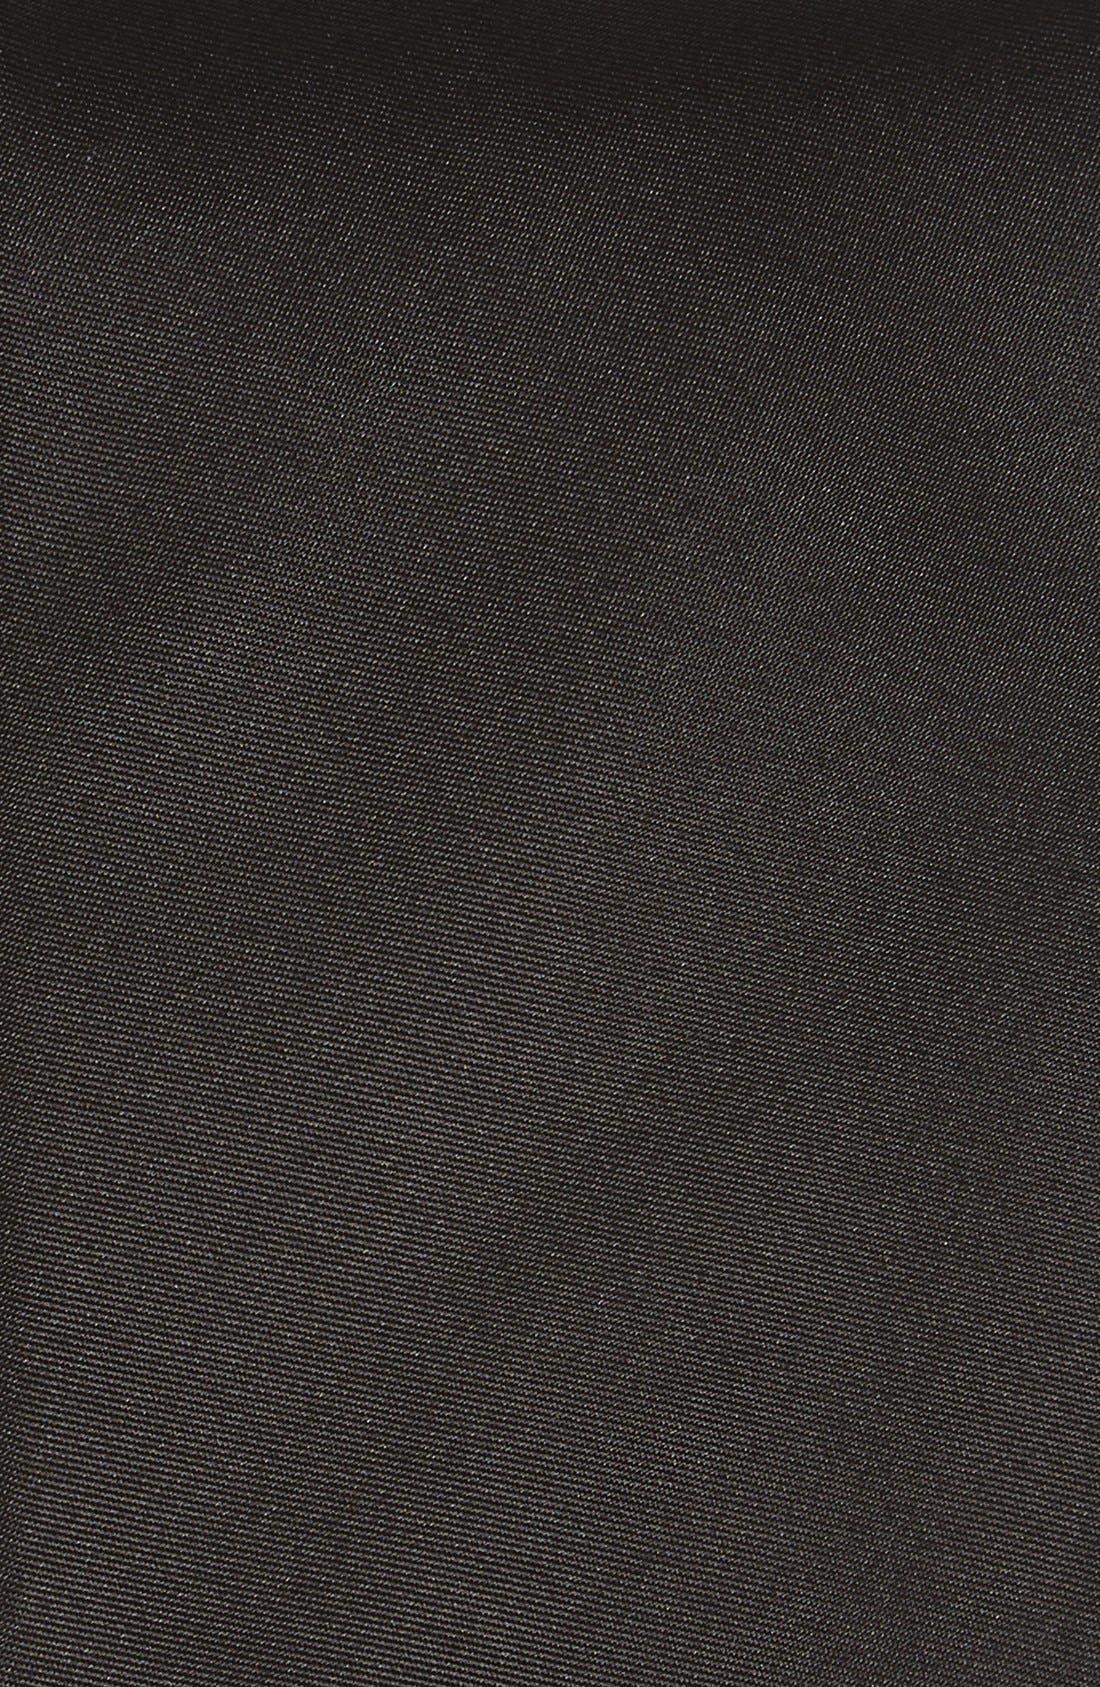 Solid Silk Skinny Tie,                             Alternate thumbnail 2, color,                             001